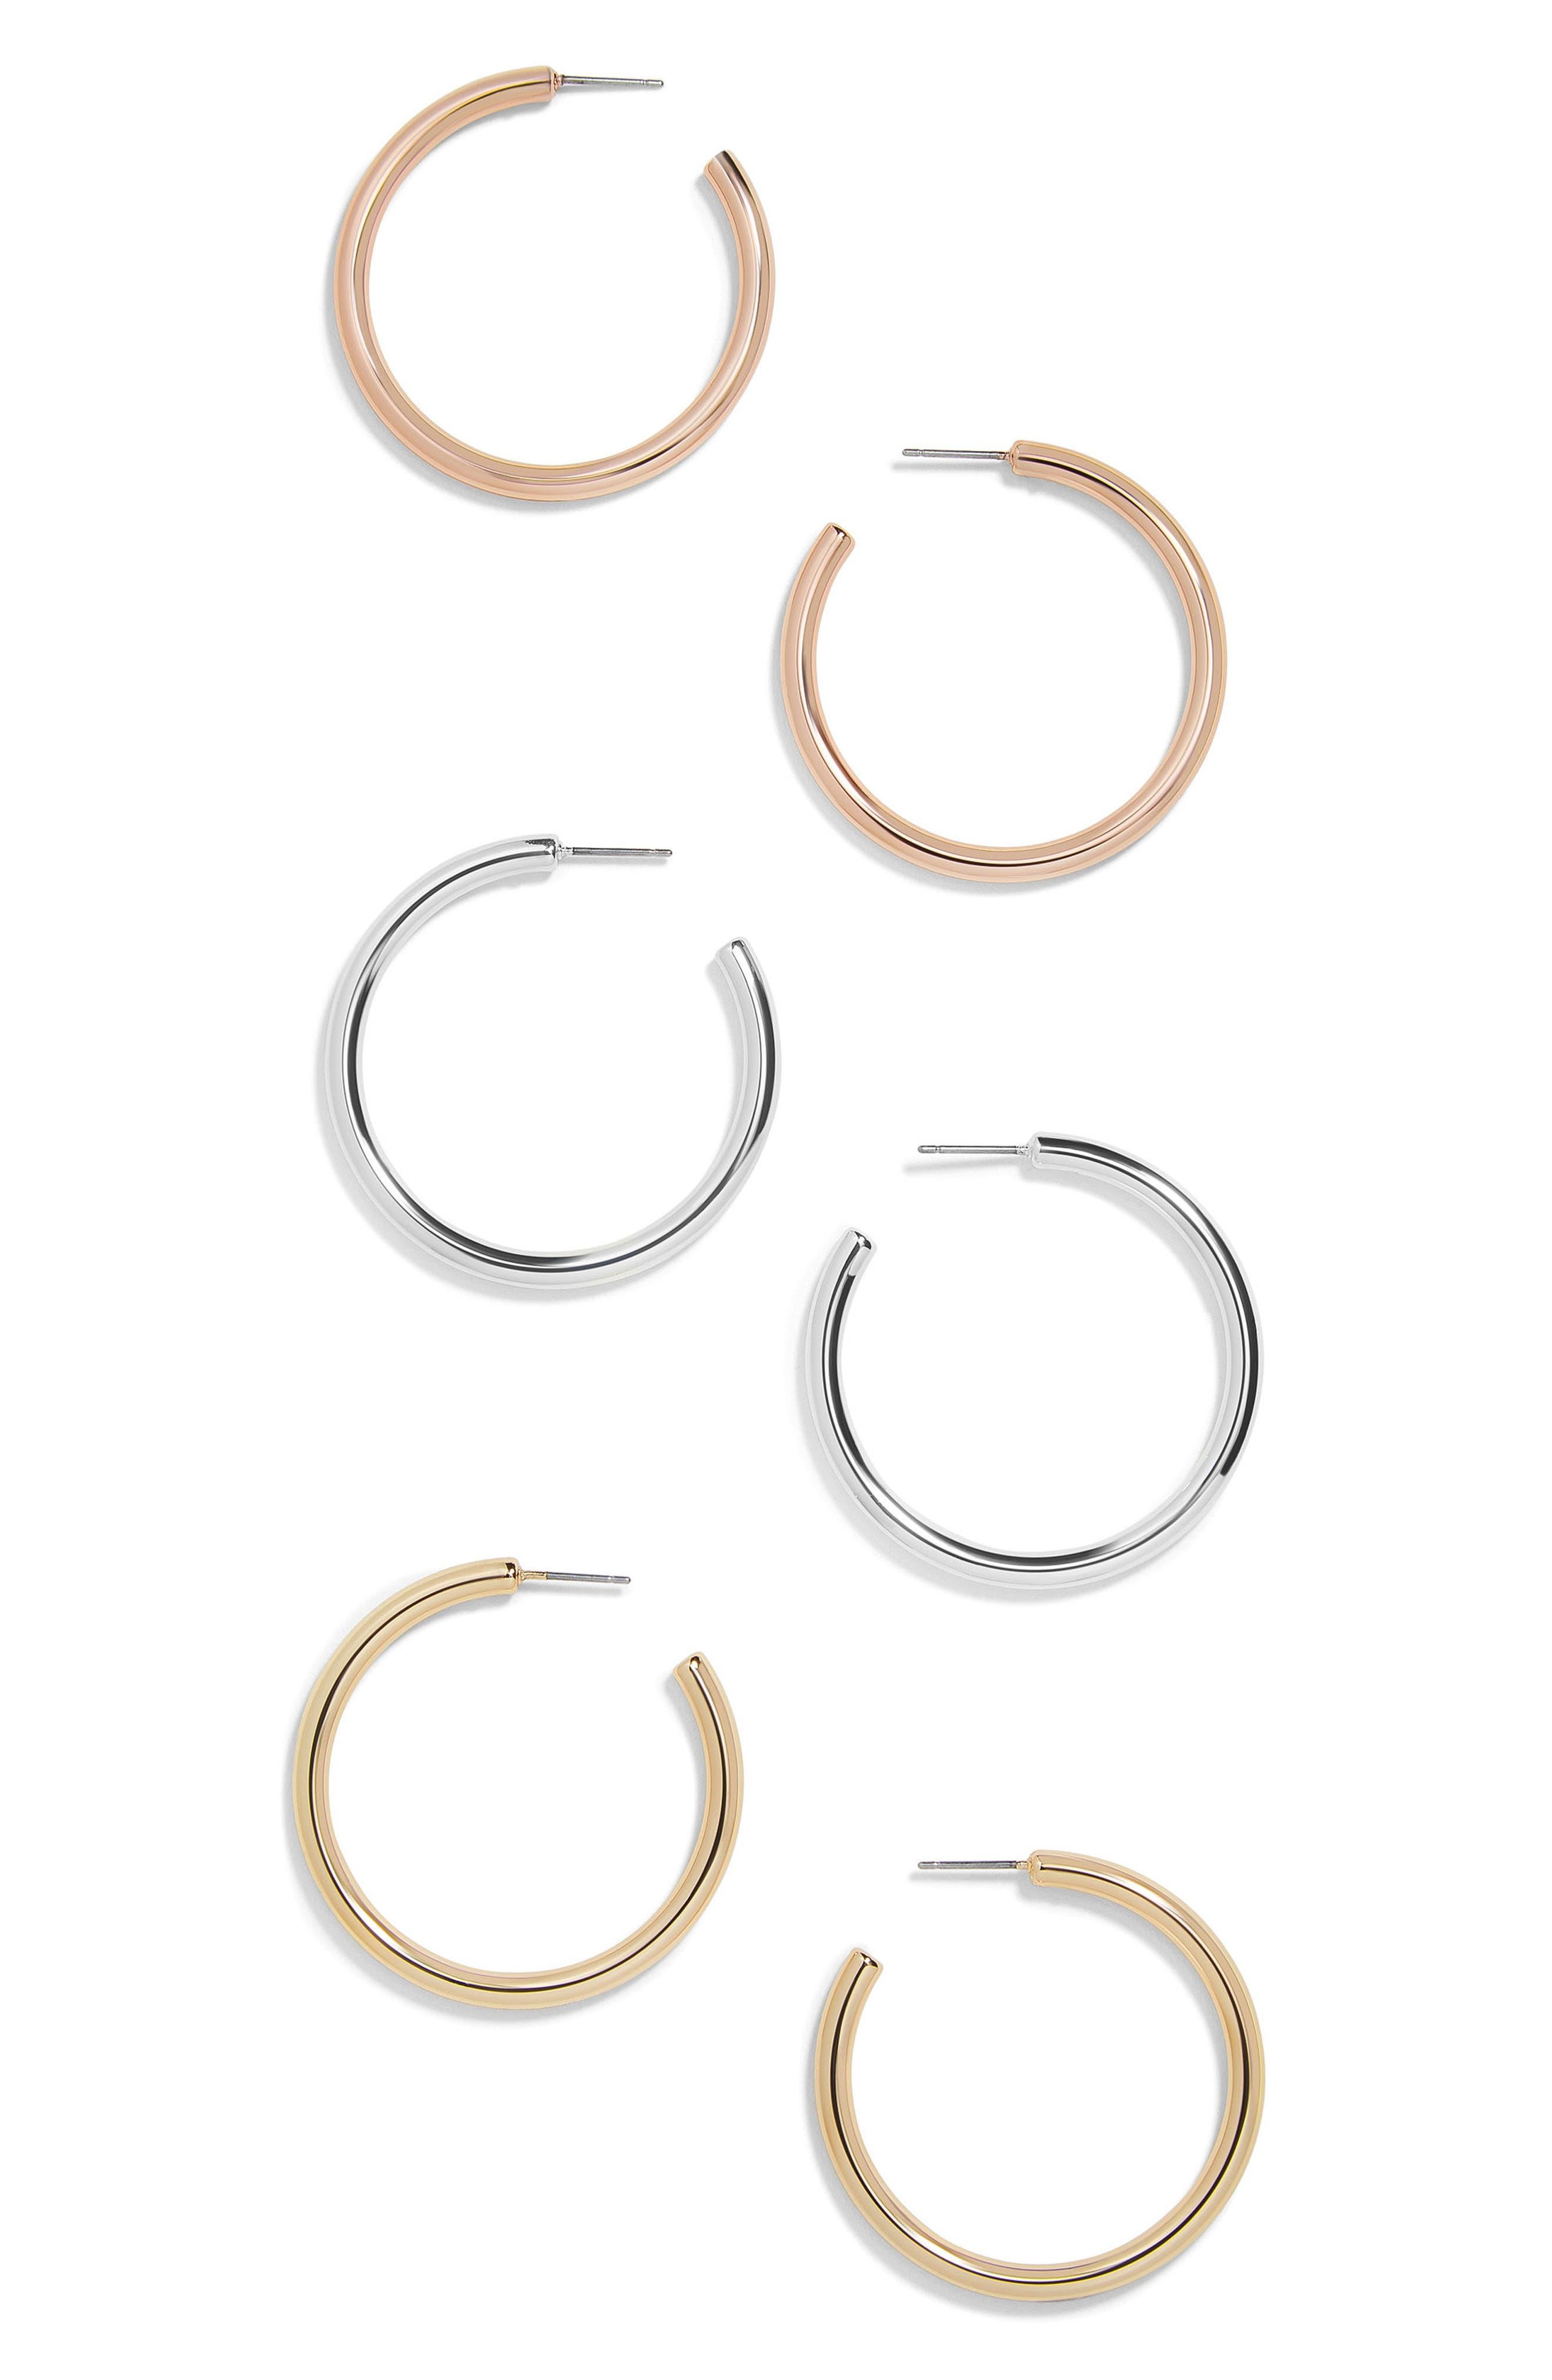 Jordan Set of 3 Hoop Earrings,                             Main thumbnail 1, color,                             710